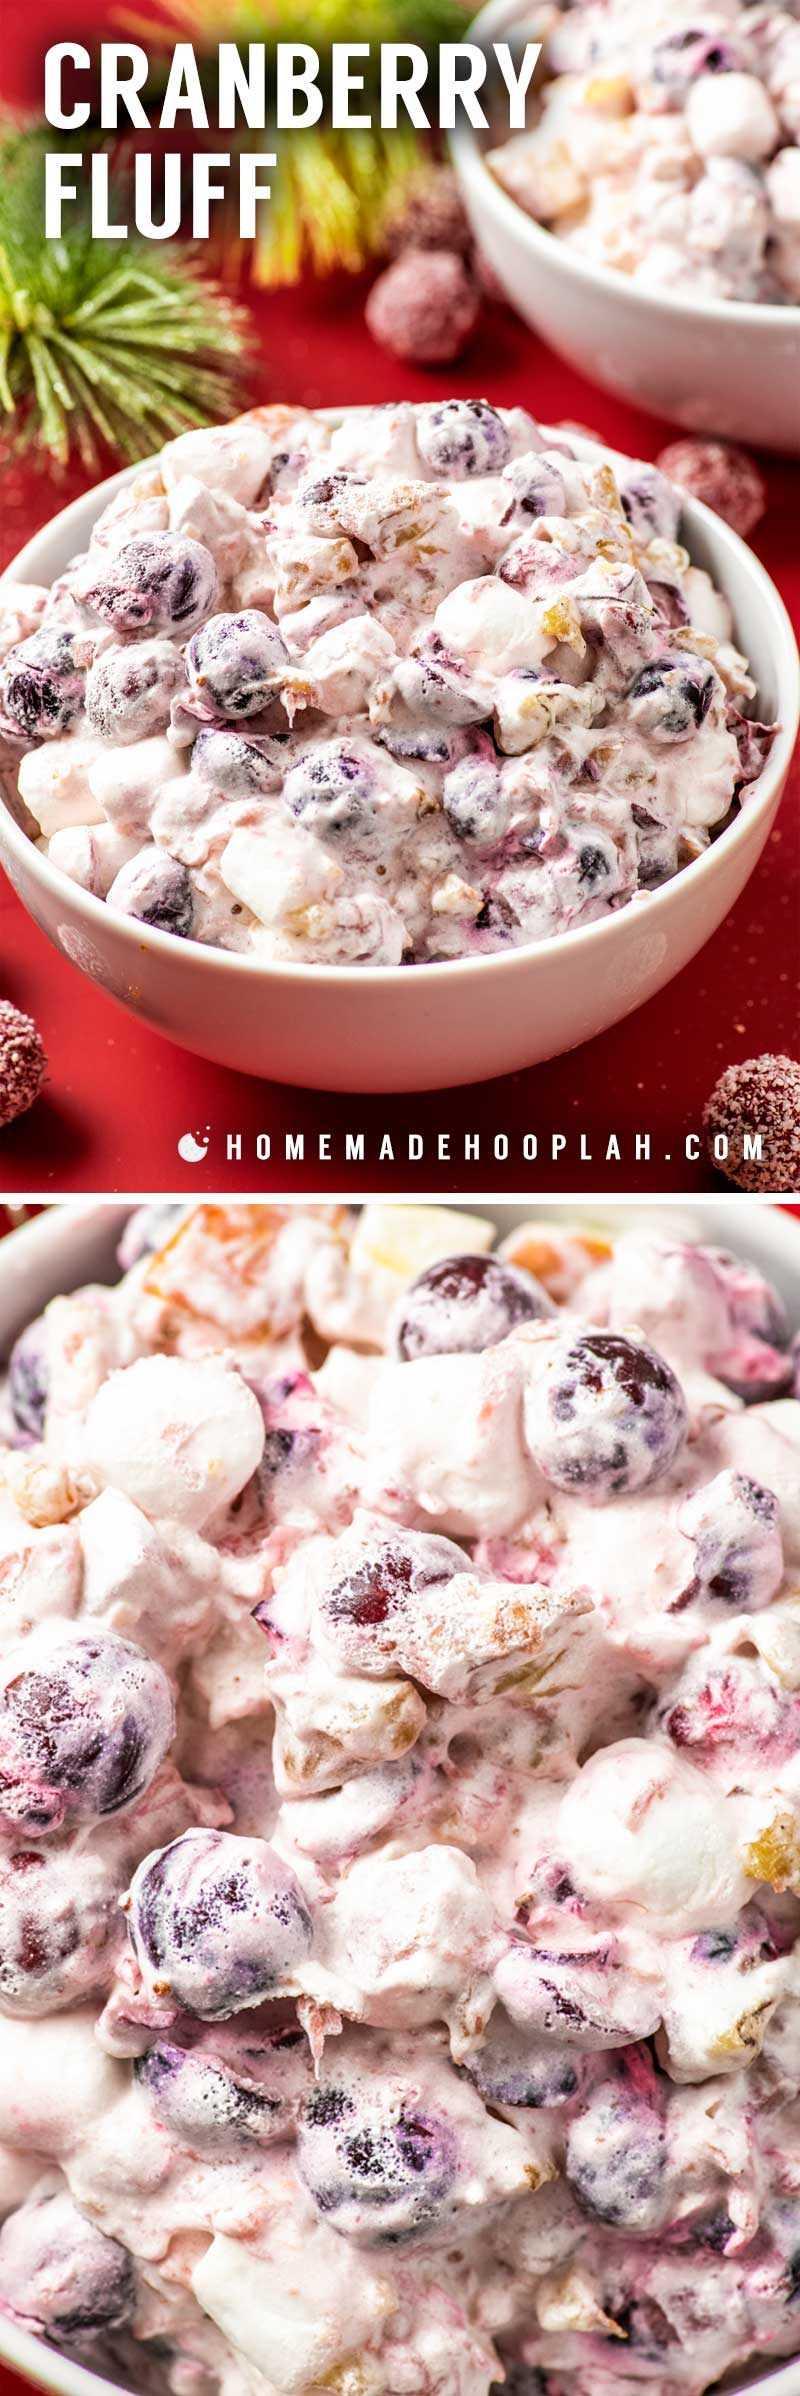 "Receta simple de ensalada de pelusa de arándano. ""Ancho ="" 800 ""altura ="" 2396 ""data-pin-description ="" ¡Pelusa de arándano! Esta ensalada de pelusa de arándano es un acompañamiento o postre de clima frío que combina arándanos agrios, piña dulce y manzanas frescas con crema suave y nueces. El | HomemadeHooplah.com ""srcset ="" https://homemadehooplah.com/wp-content/uploads/2019/01/cranberry-fluff-salad-pinterest.jpg 800w, https://homemadehooplah.com/wp-content/uploads/ 2019/01 / cranberry-fluff-salad-pinterest-400x1198.jpg 400w, https://homemadehooplah.com/wp-content/uploads/2019/01/cranberry-fluff-salad-pinterest-768x2300.jpg 768w ""tamaños = ""(ancho máximo: 800px) 100vw, 800px"